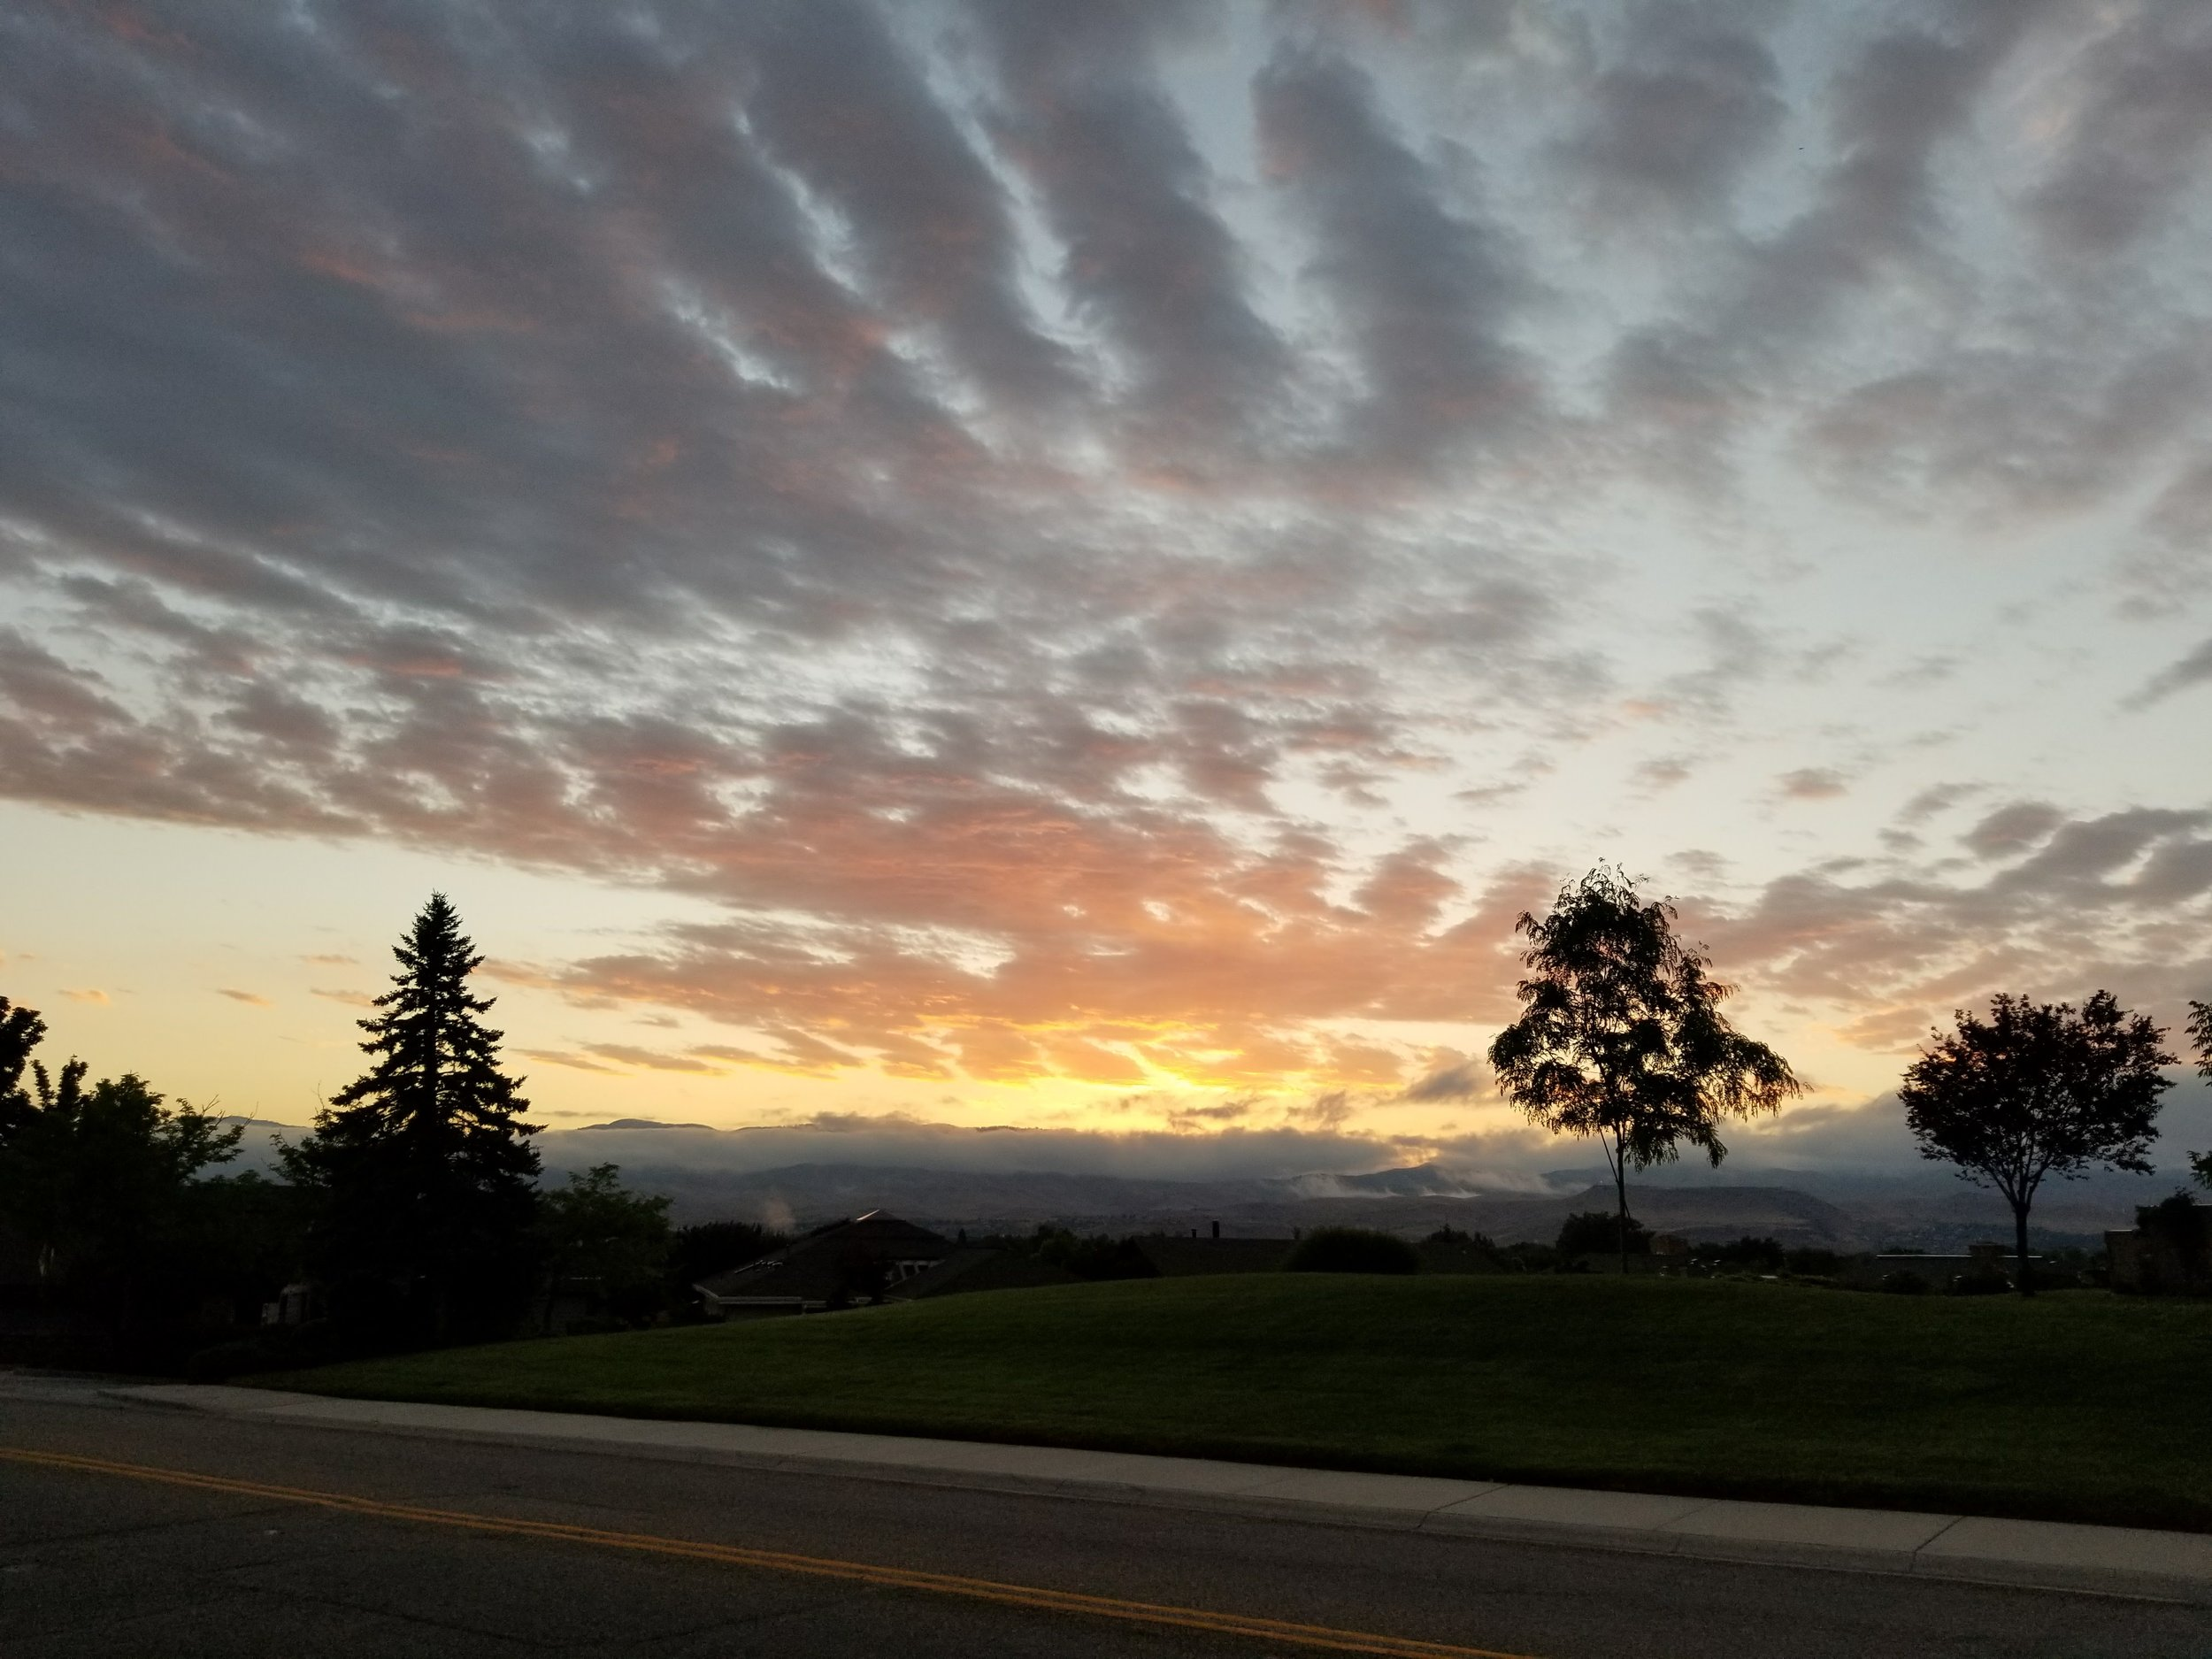 State #10 of RunExplore. Hello sunrise.